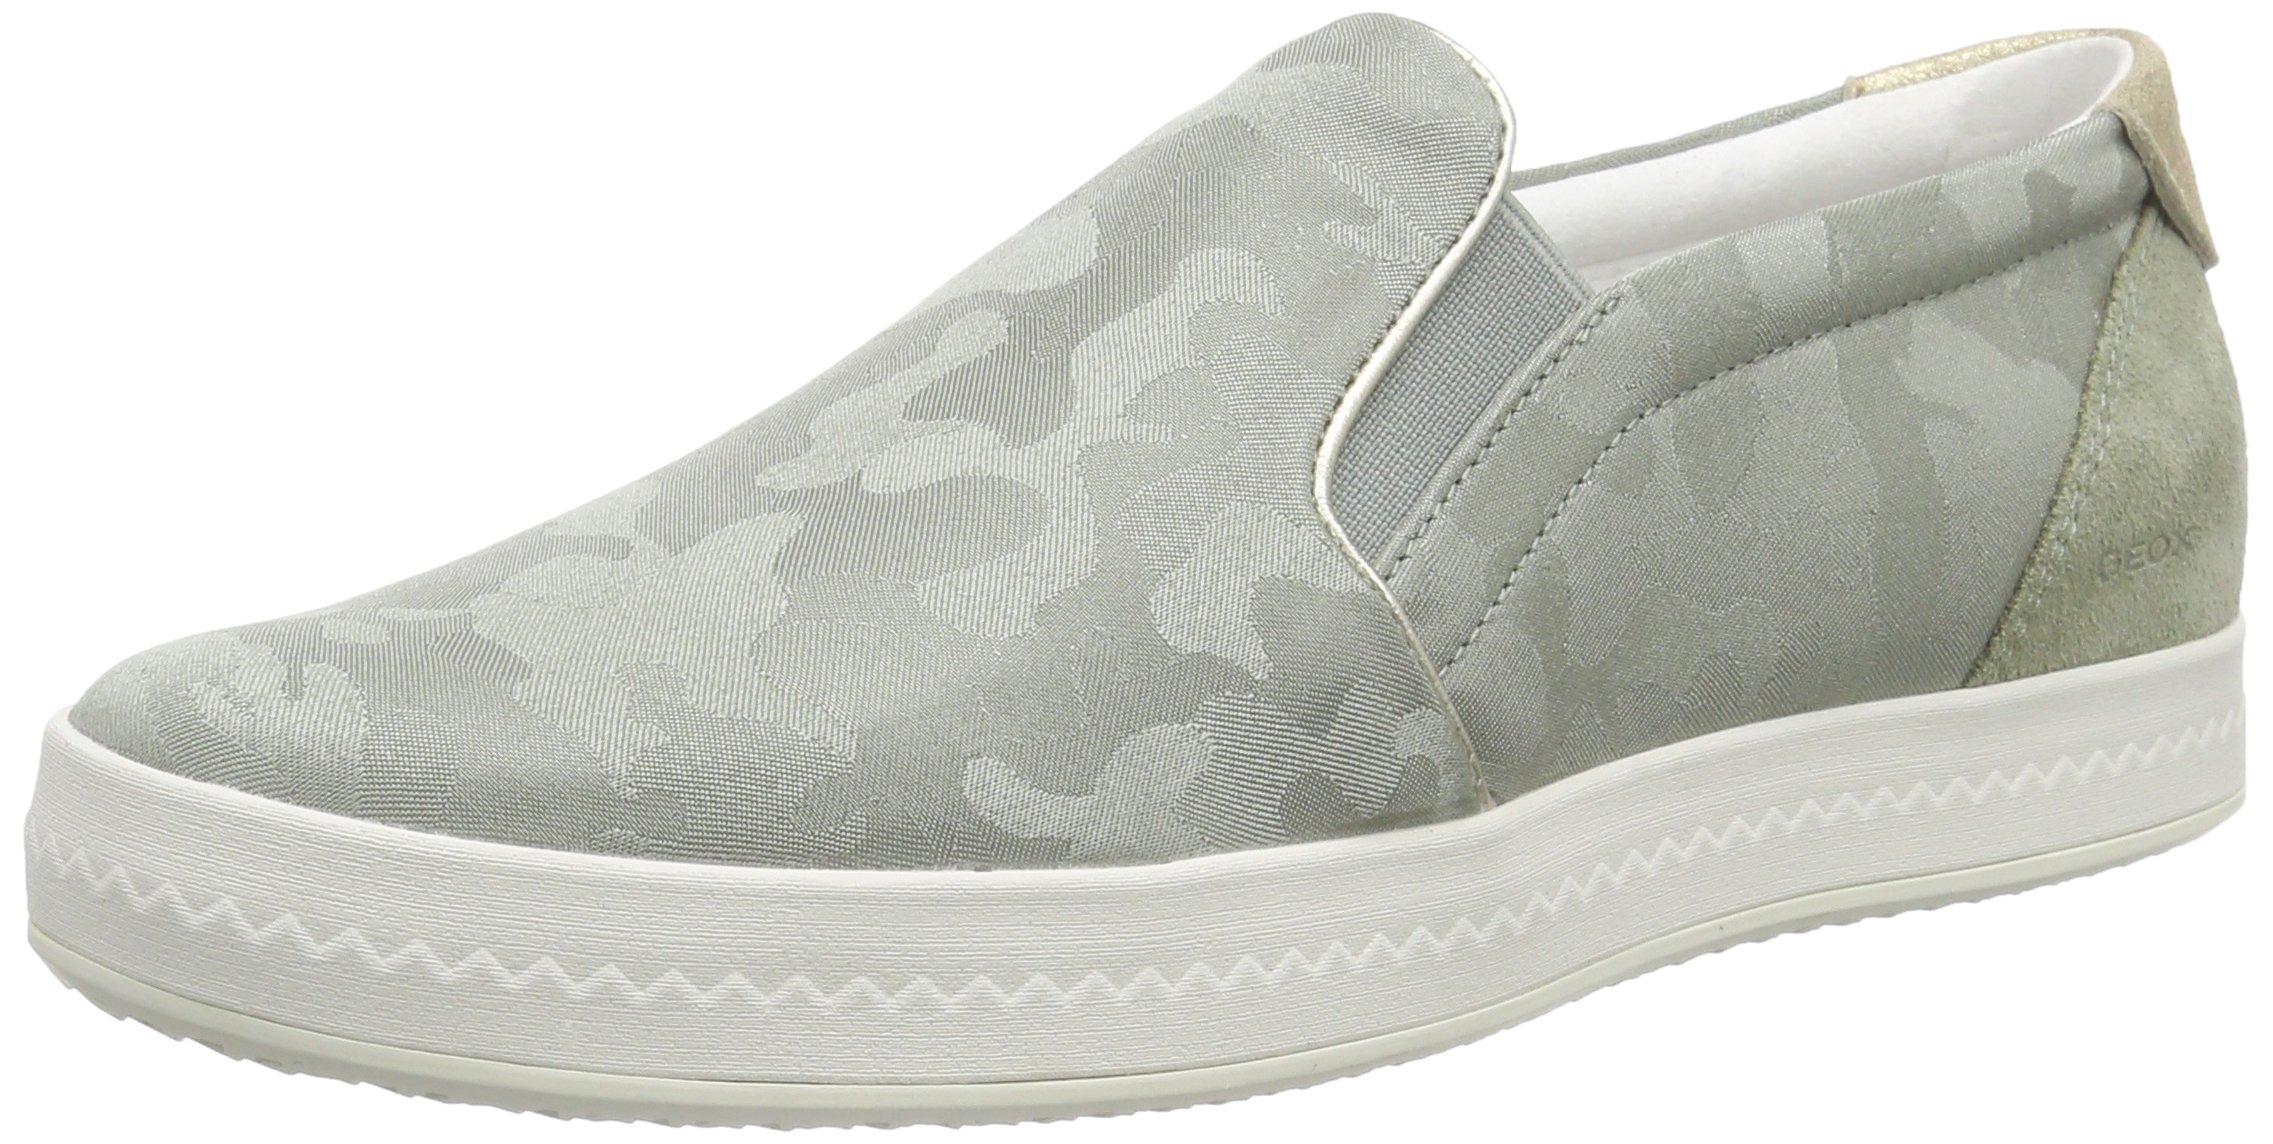 Low ChaussuresMarronsageTaille GeoxD4429c00011c3016 35 GeoxD4429c00011c3016 Low top top fgb6y7